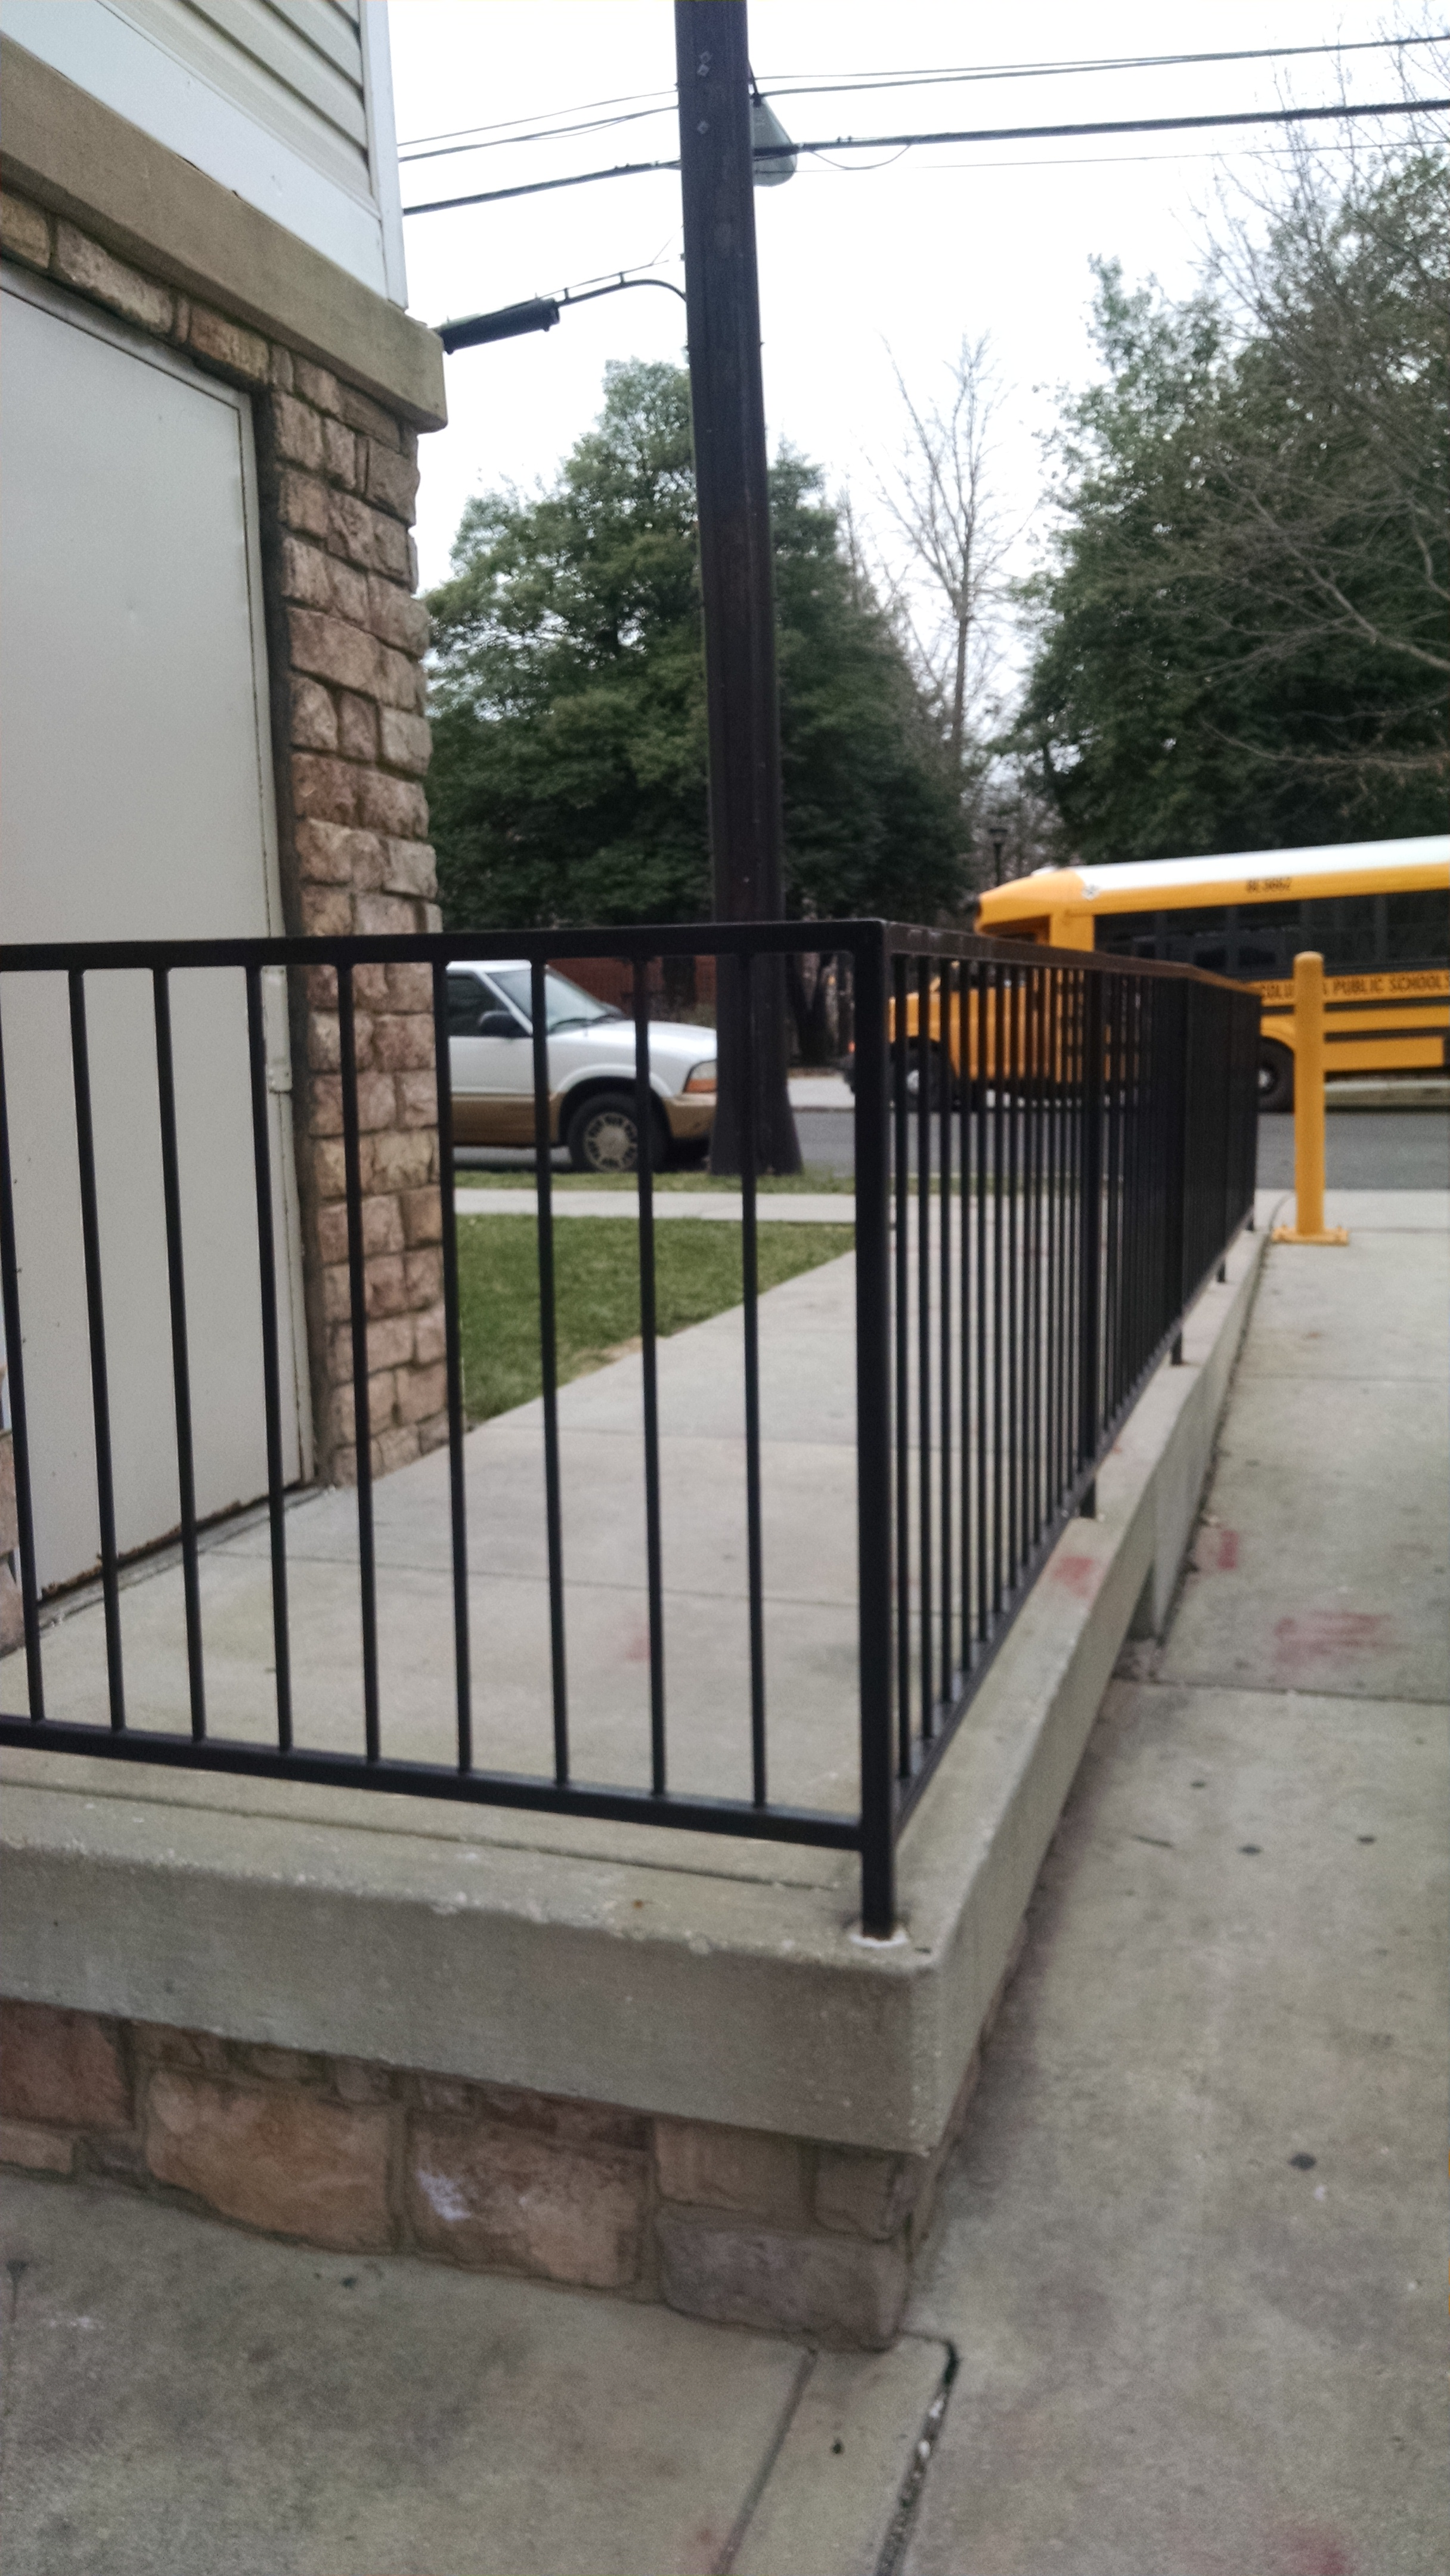 Ramp rails